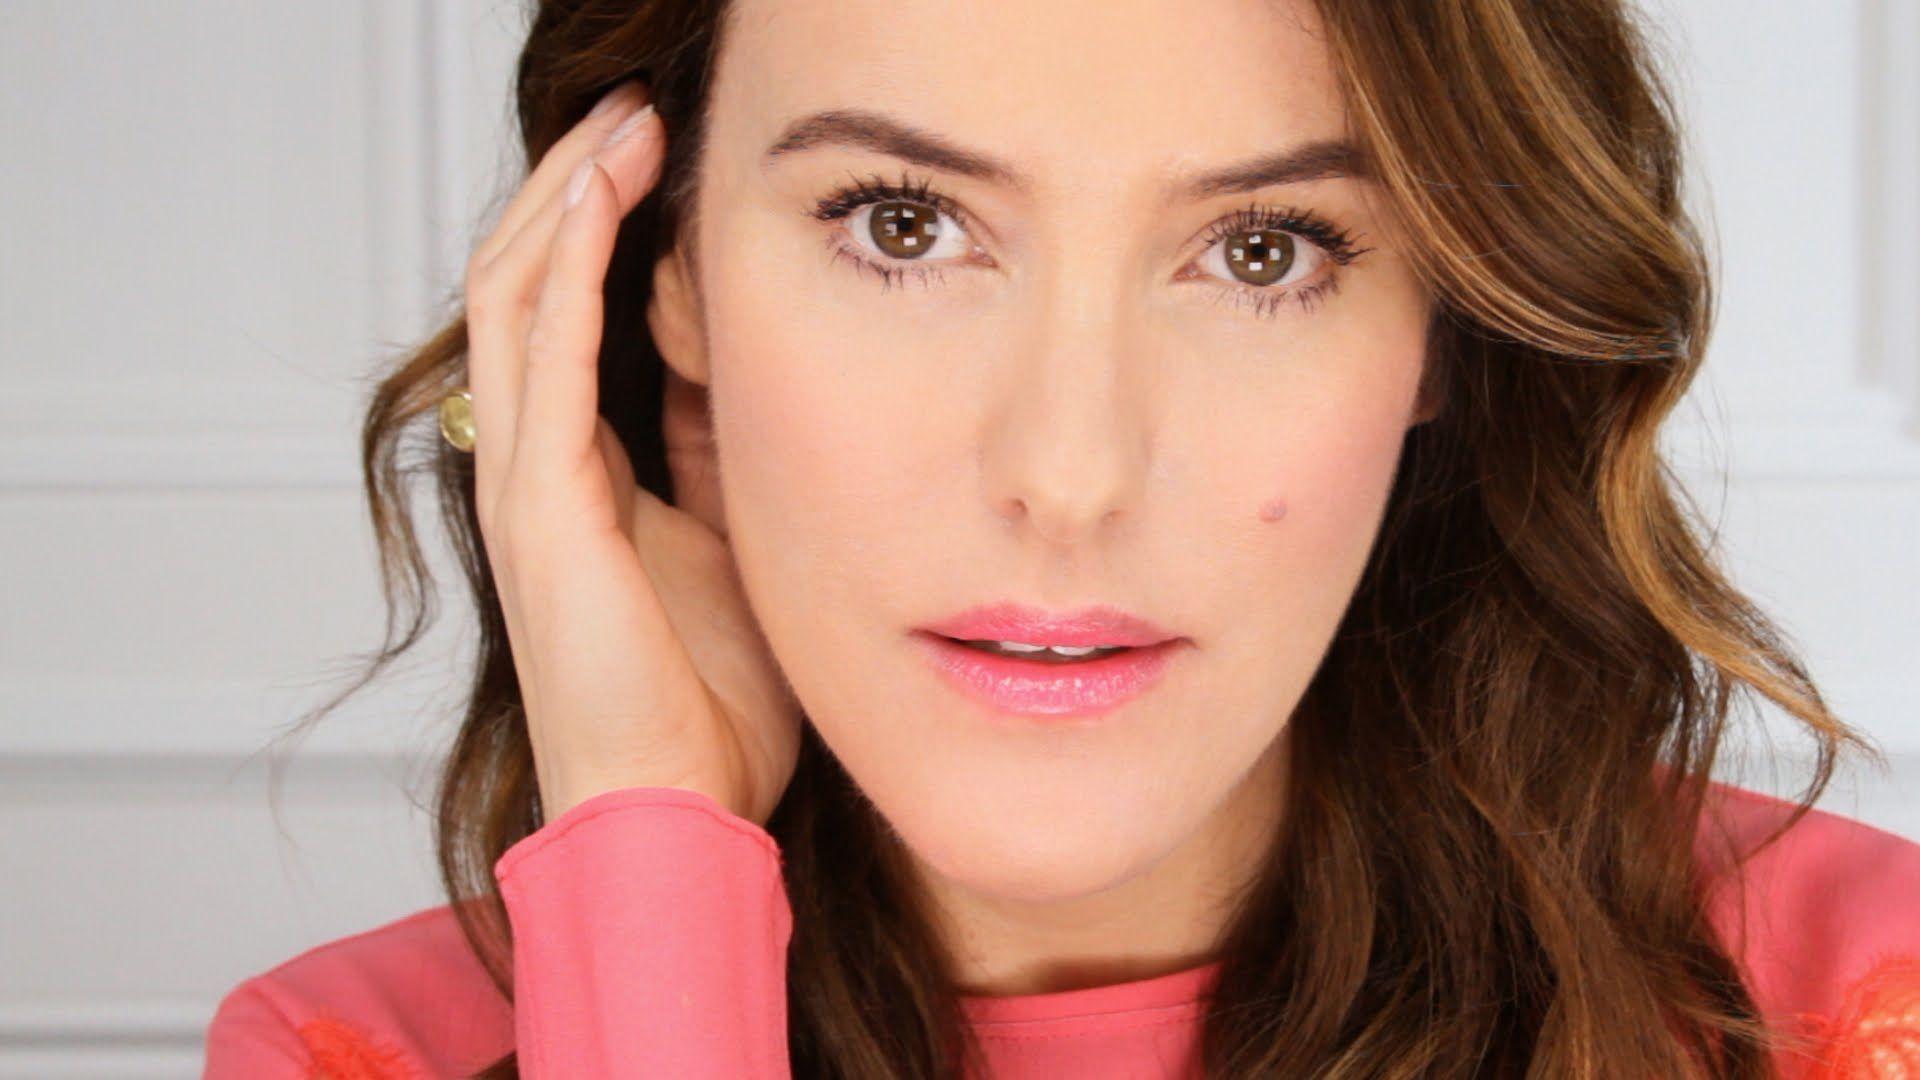 Quick wakeup makeup tutorial by lisa eldridge with lancme gettin quick wakeup makeup tutorial by lisa eldridge with lancme baditri Choice Image